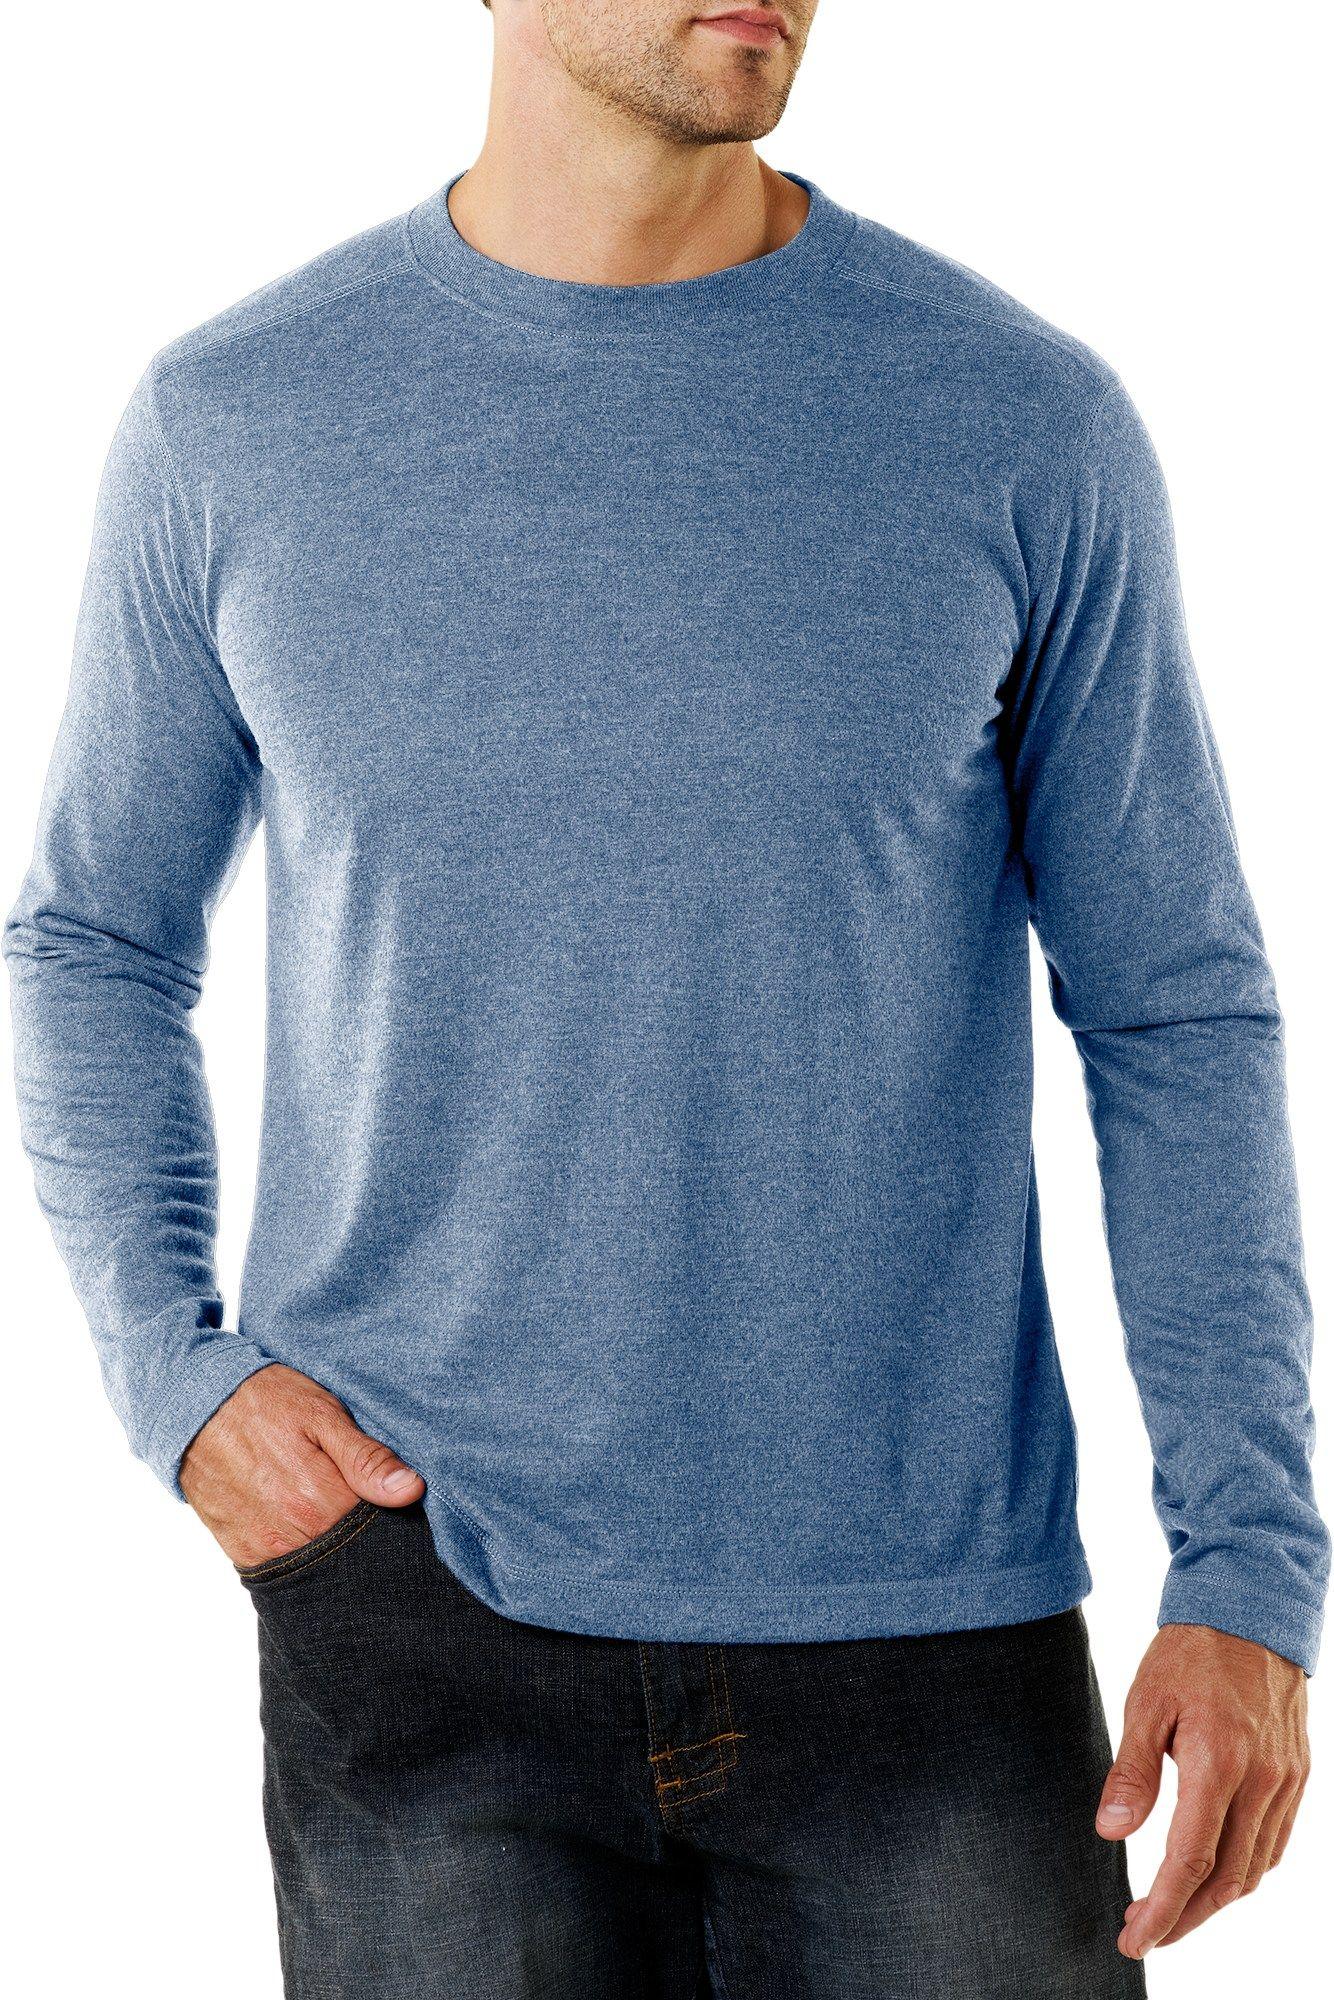 2a03c4a9 Sahara Long-Sleeve T-Shirt - Men's | Products I Love | T shirt, Long ...